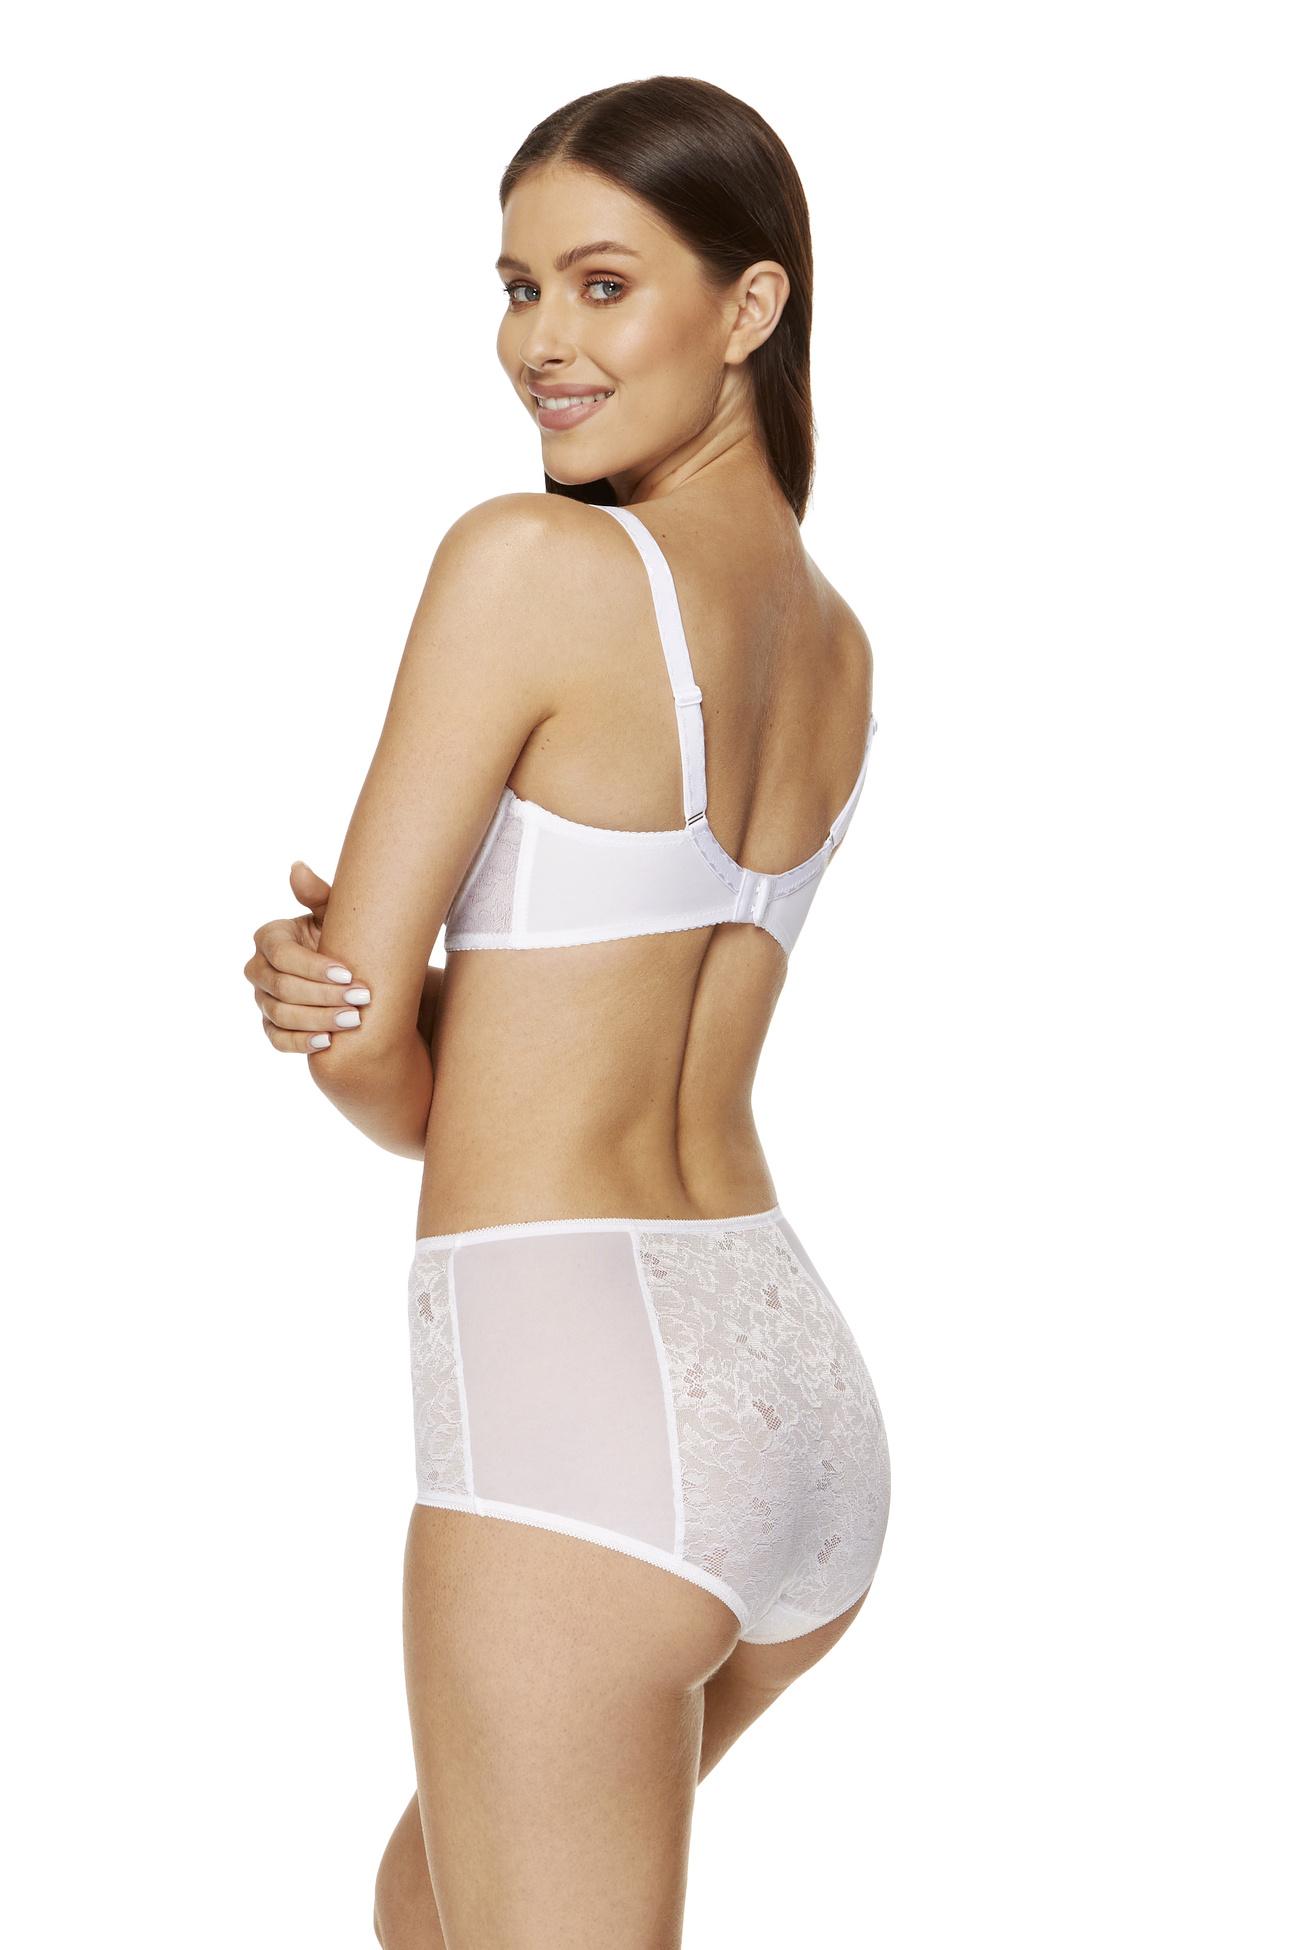 Gorteks Elise FW high waist panty white Classic collection 40c97505b